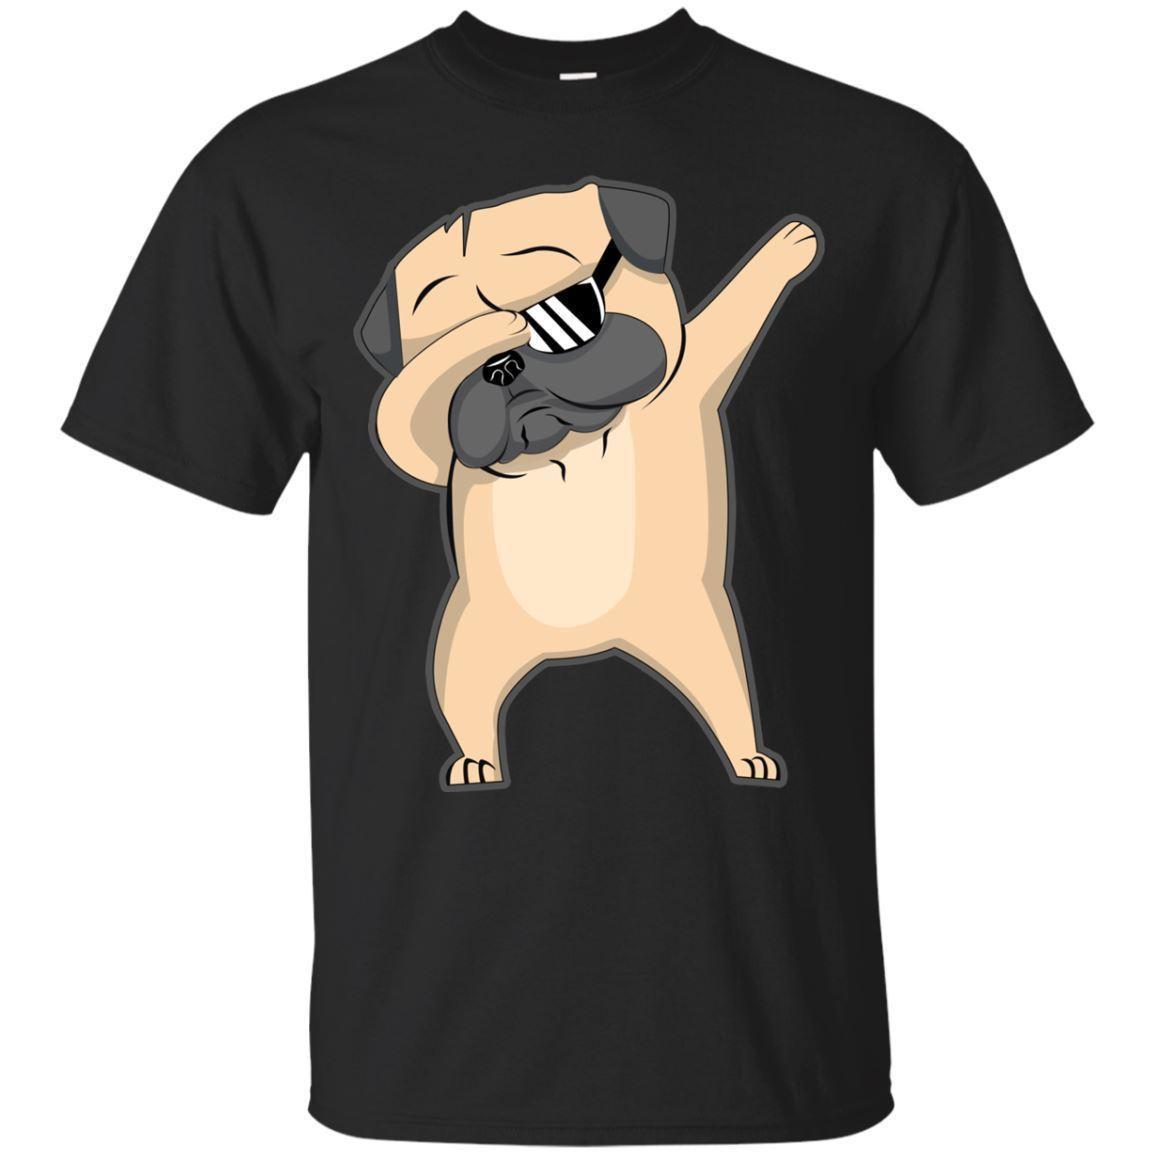 ca96d03c Pug Shirt Cute Funny Dog Dab T Shirt, Funny Black T Shirt For Men, Women Cool  Tee Shirt T Shirt Online Buy From Goodencounter60, $11.63| DHgate.Com